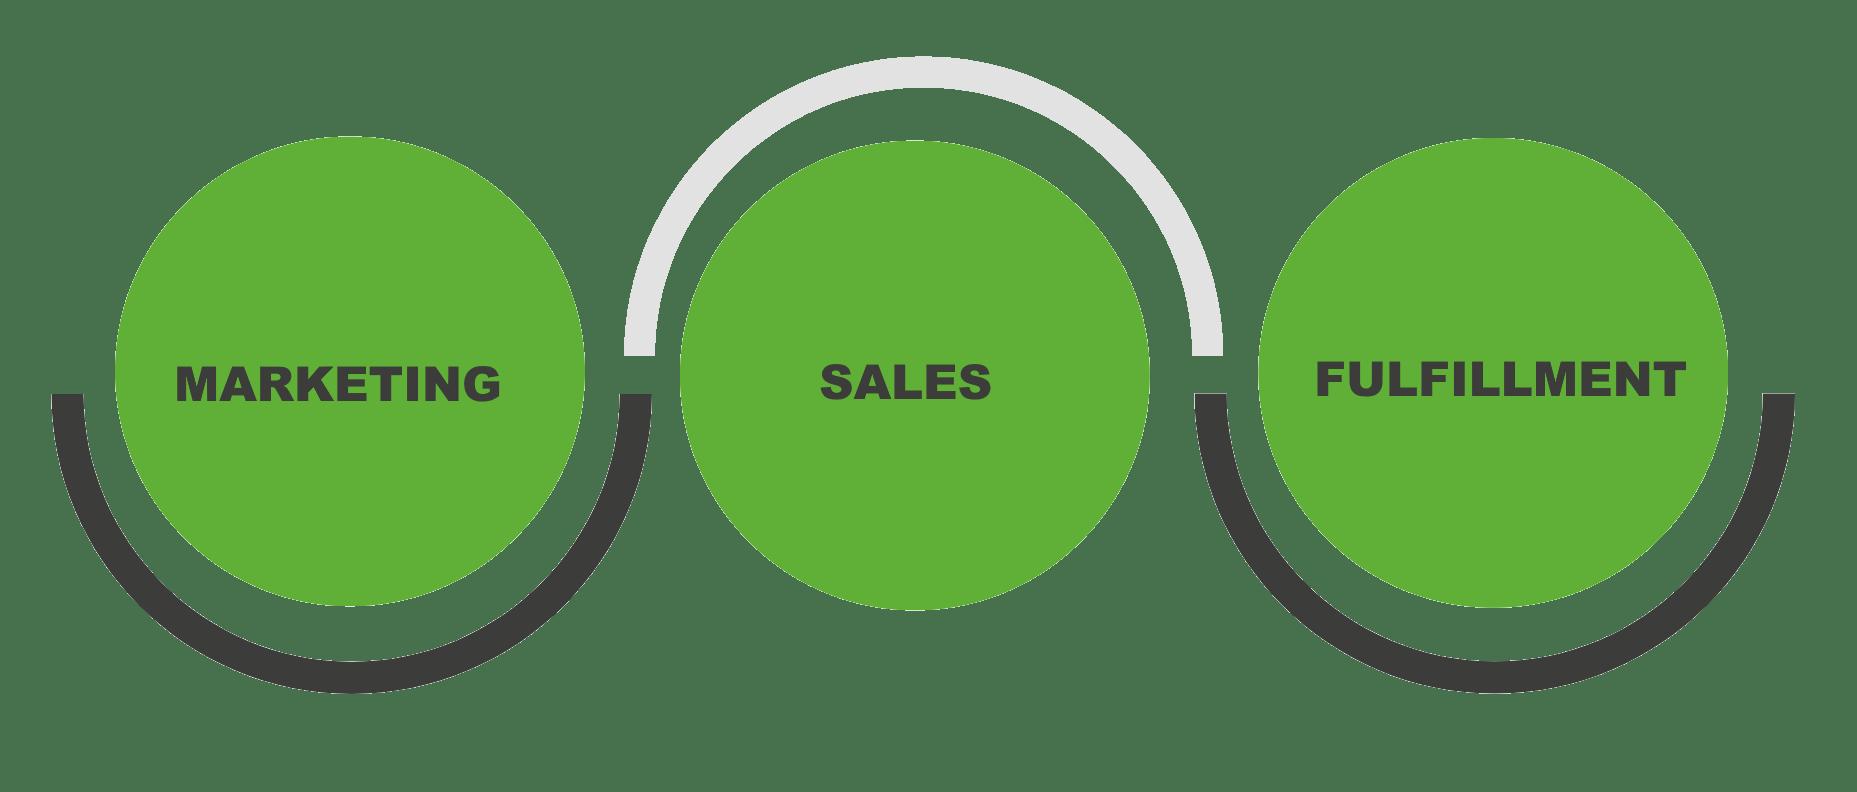 marketing-sales-fulfillment